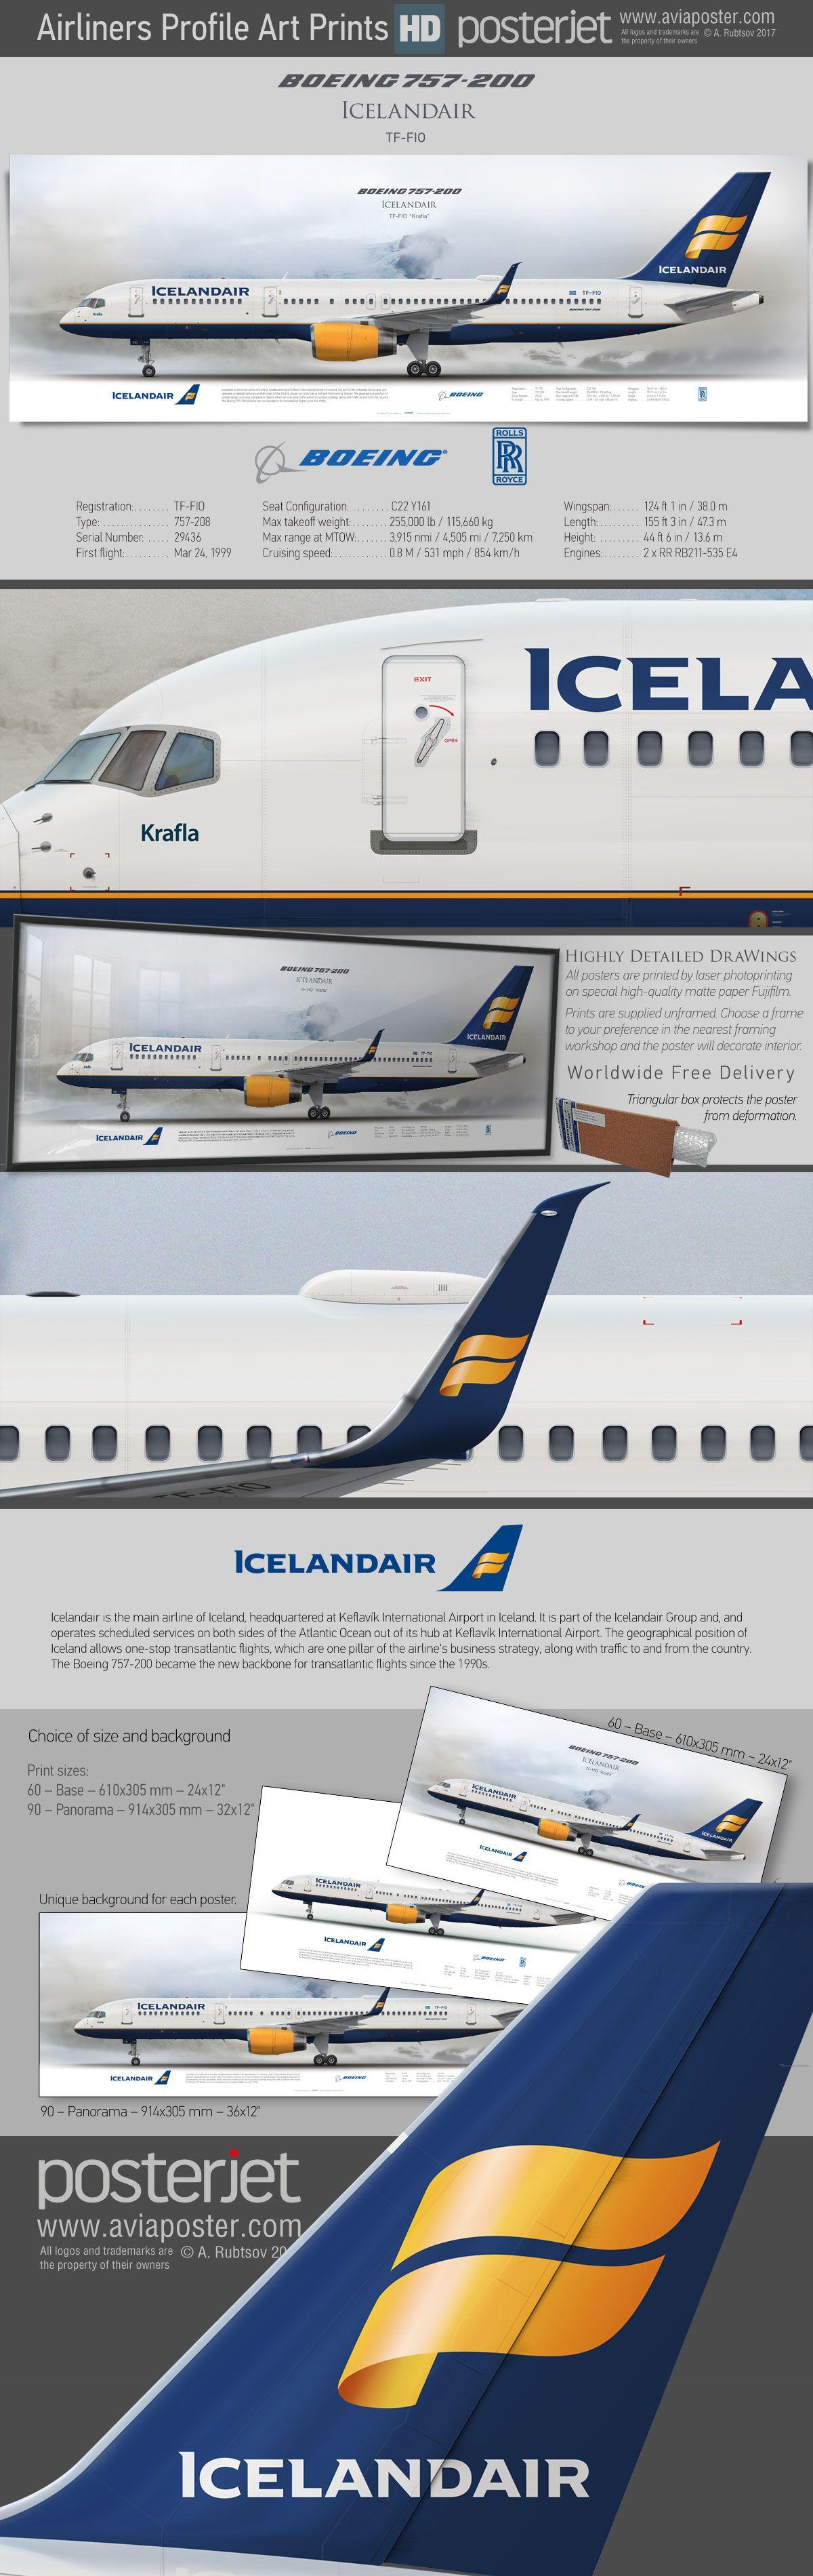 Boeing 757 200 Icelandair Tf Fio Www Aviaposter Com Aviation Jetliner Airplane Pilot Aviationlovers Avgeek Aviation Pilots Aviation Aviation Posters